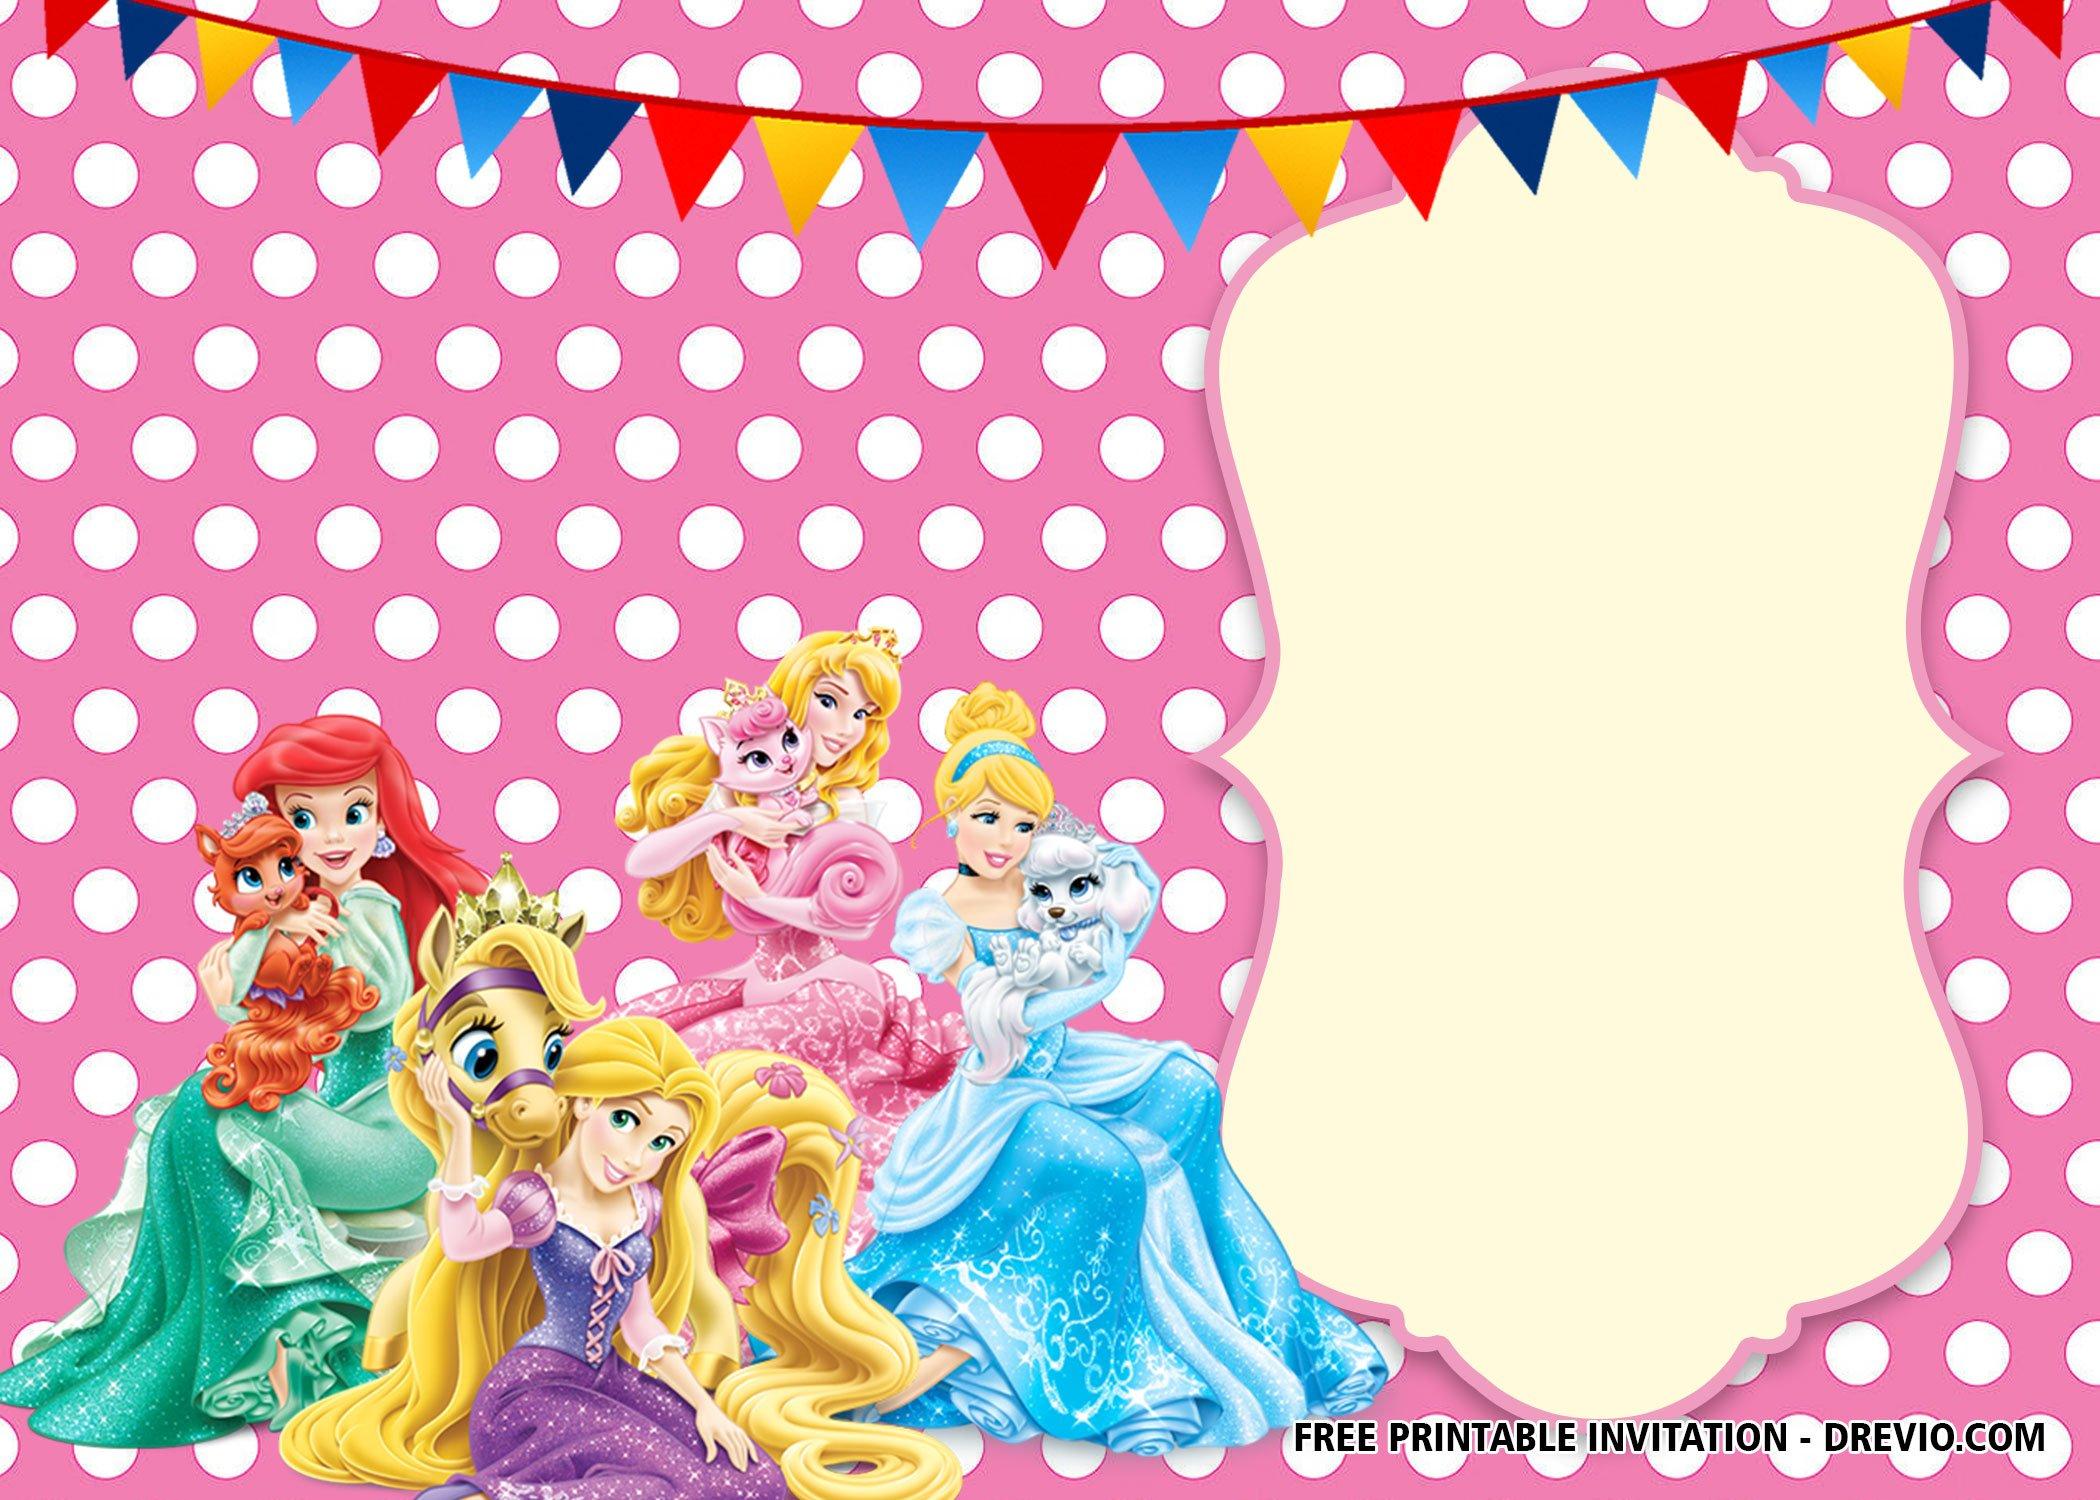 free printable disney princess polkadot